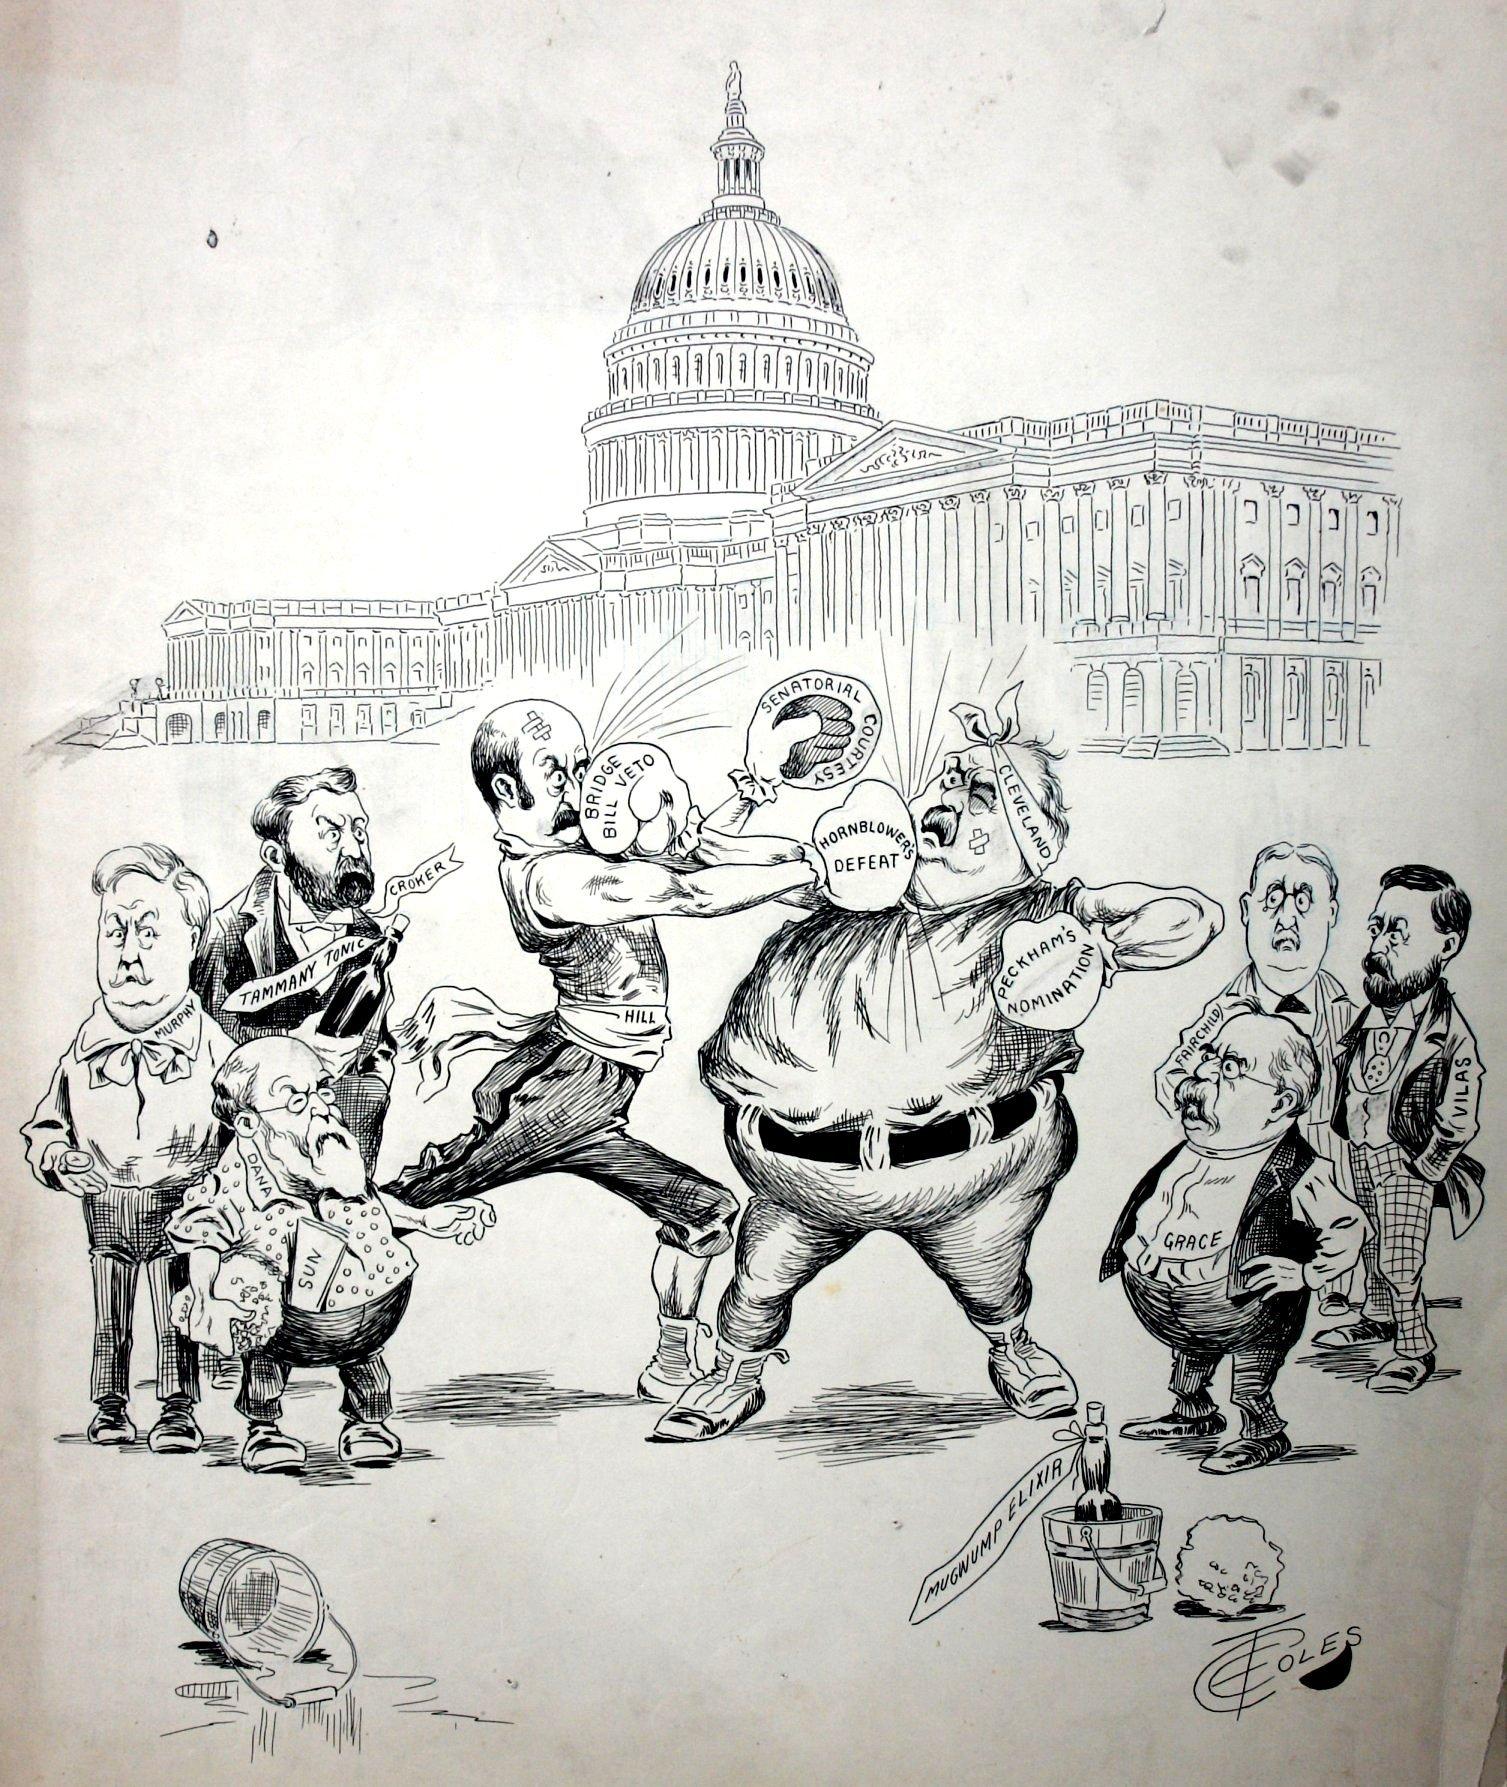 Cartoon political boxing cartoon 12.